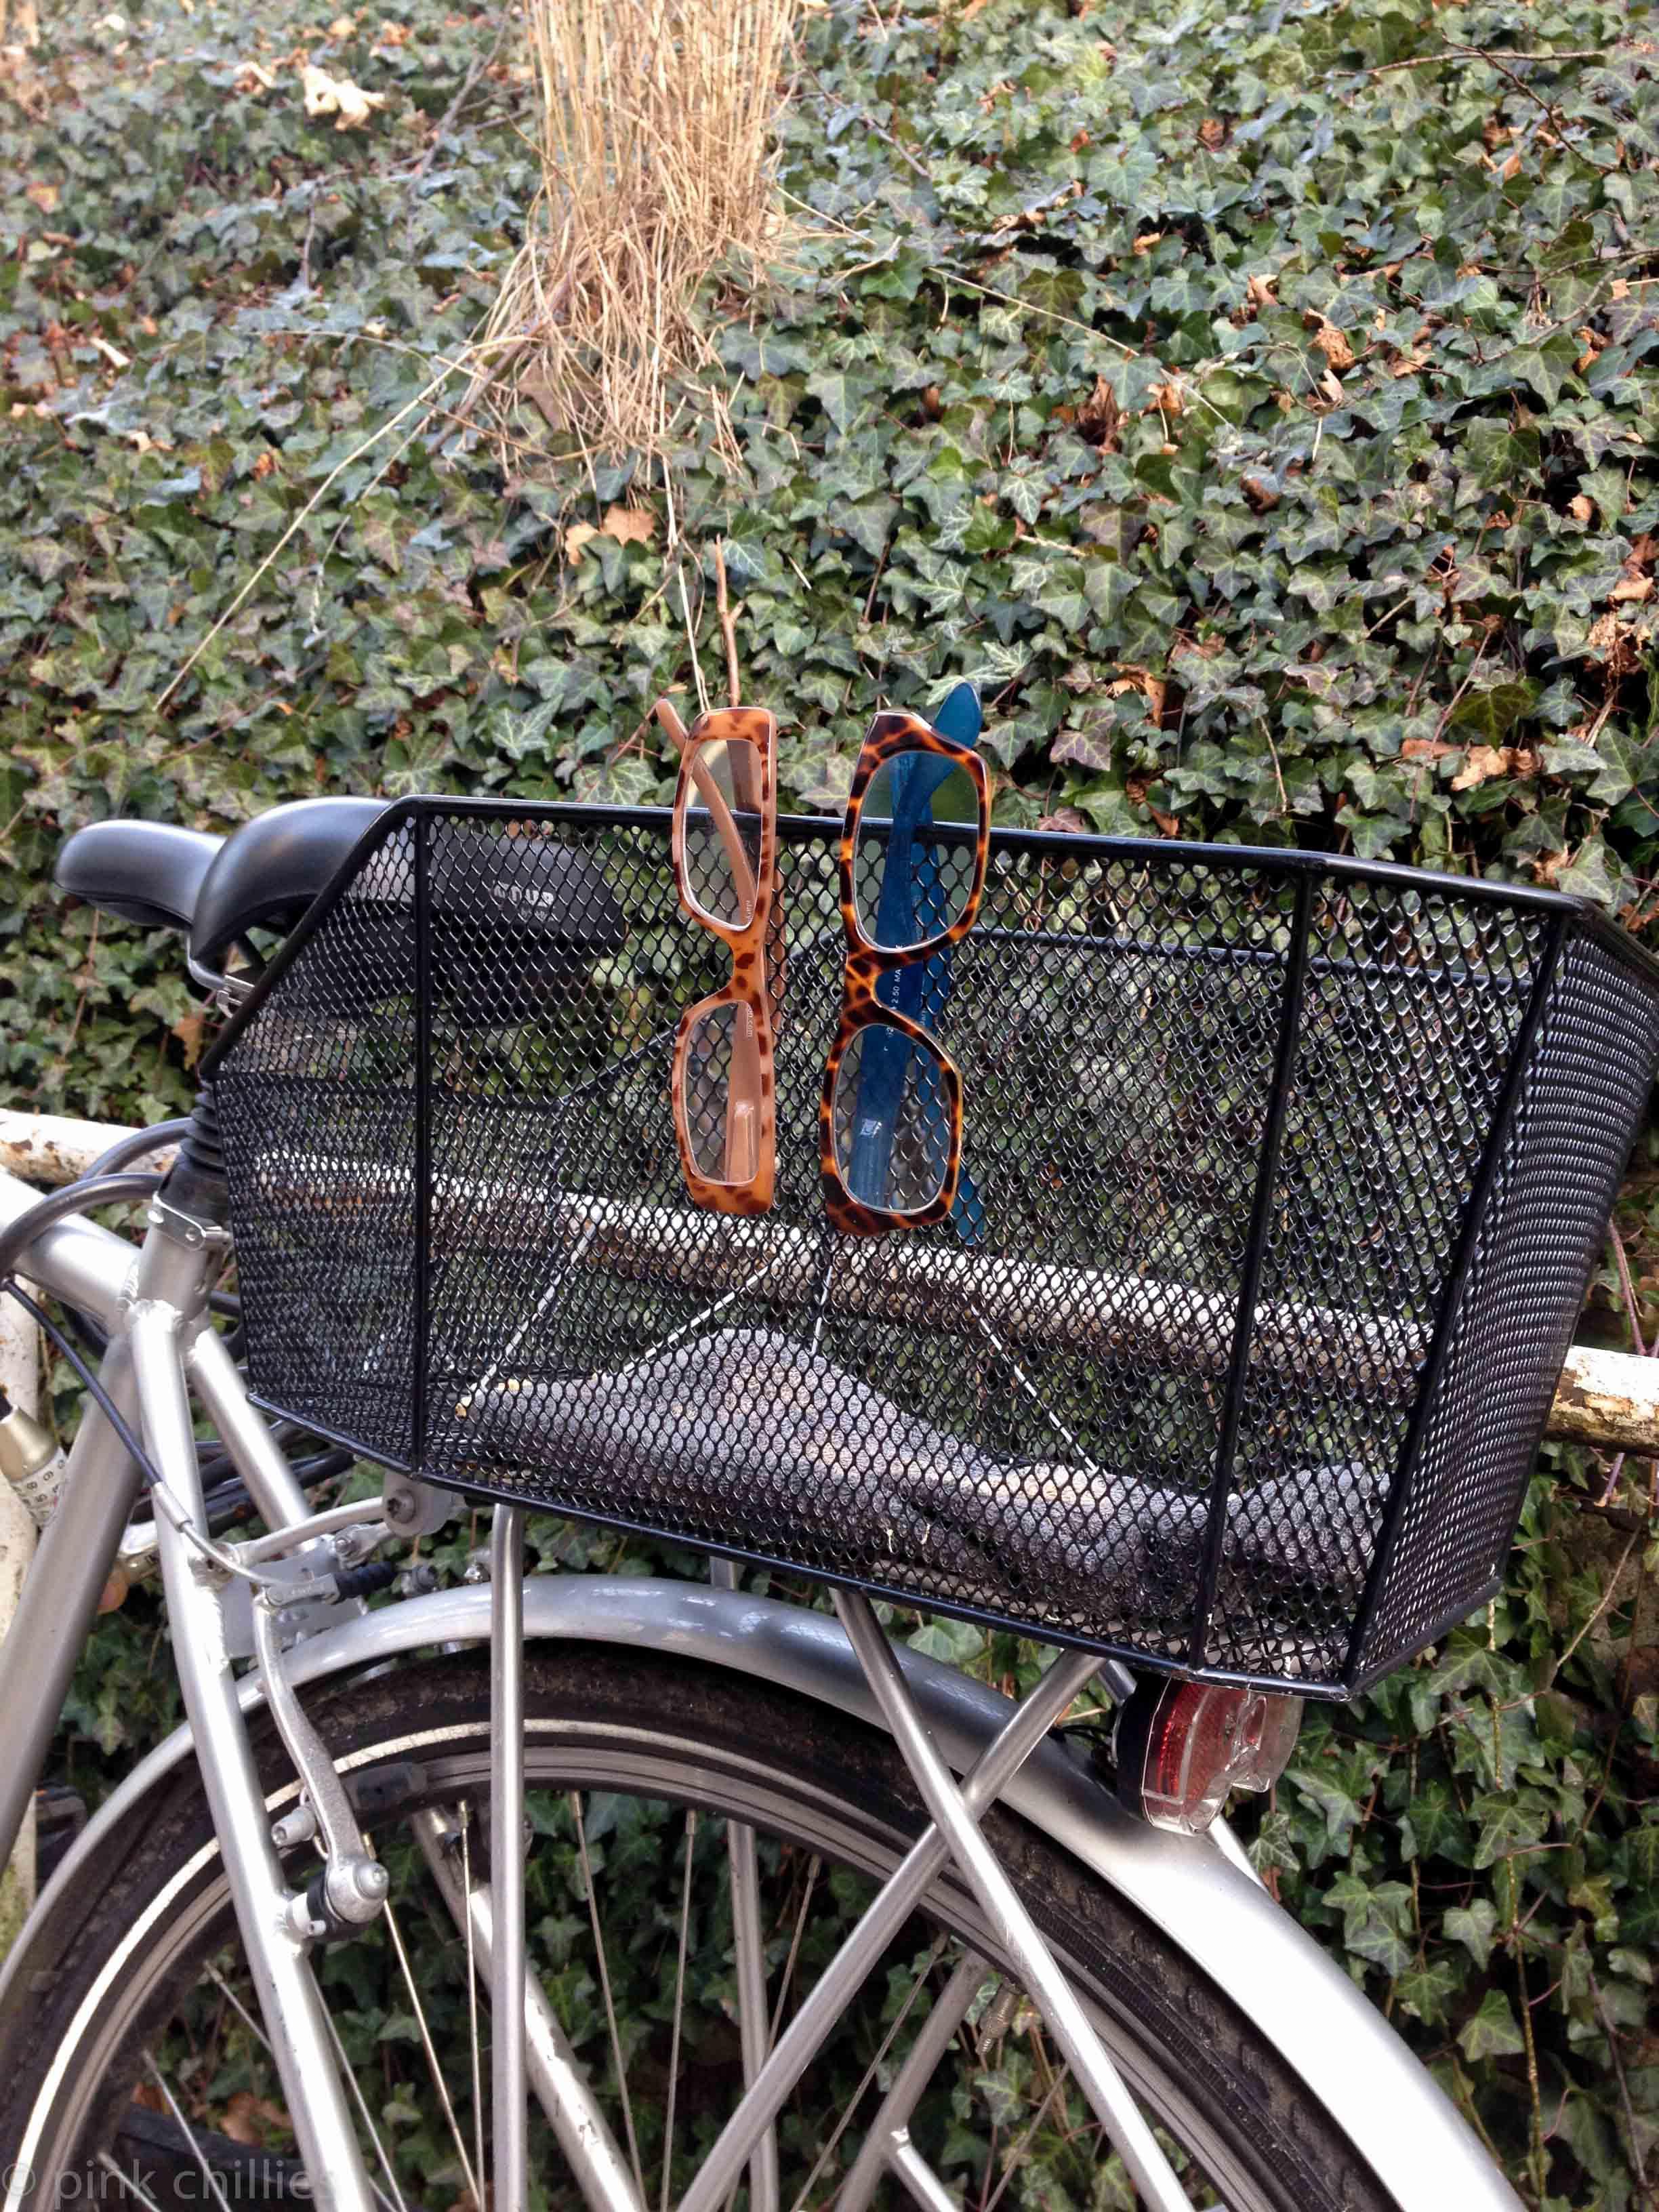 Lesebrillen am Fahrradkorb